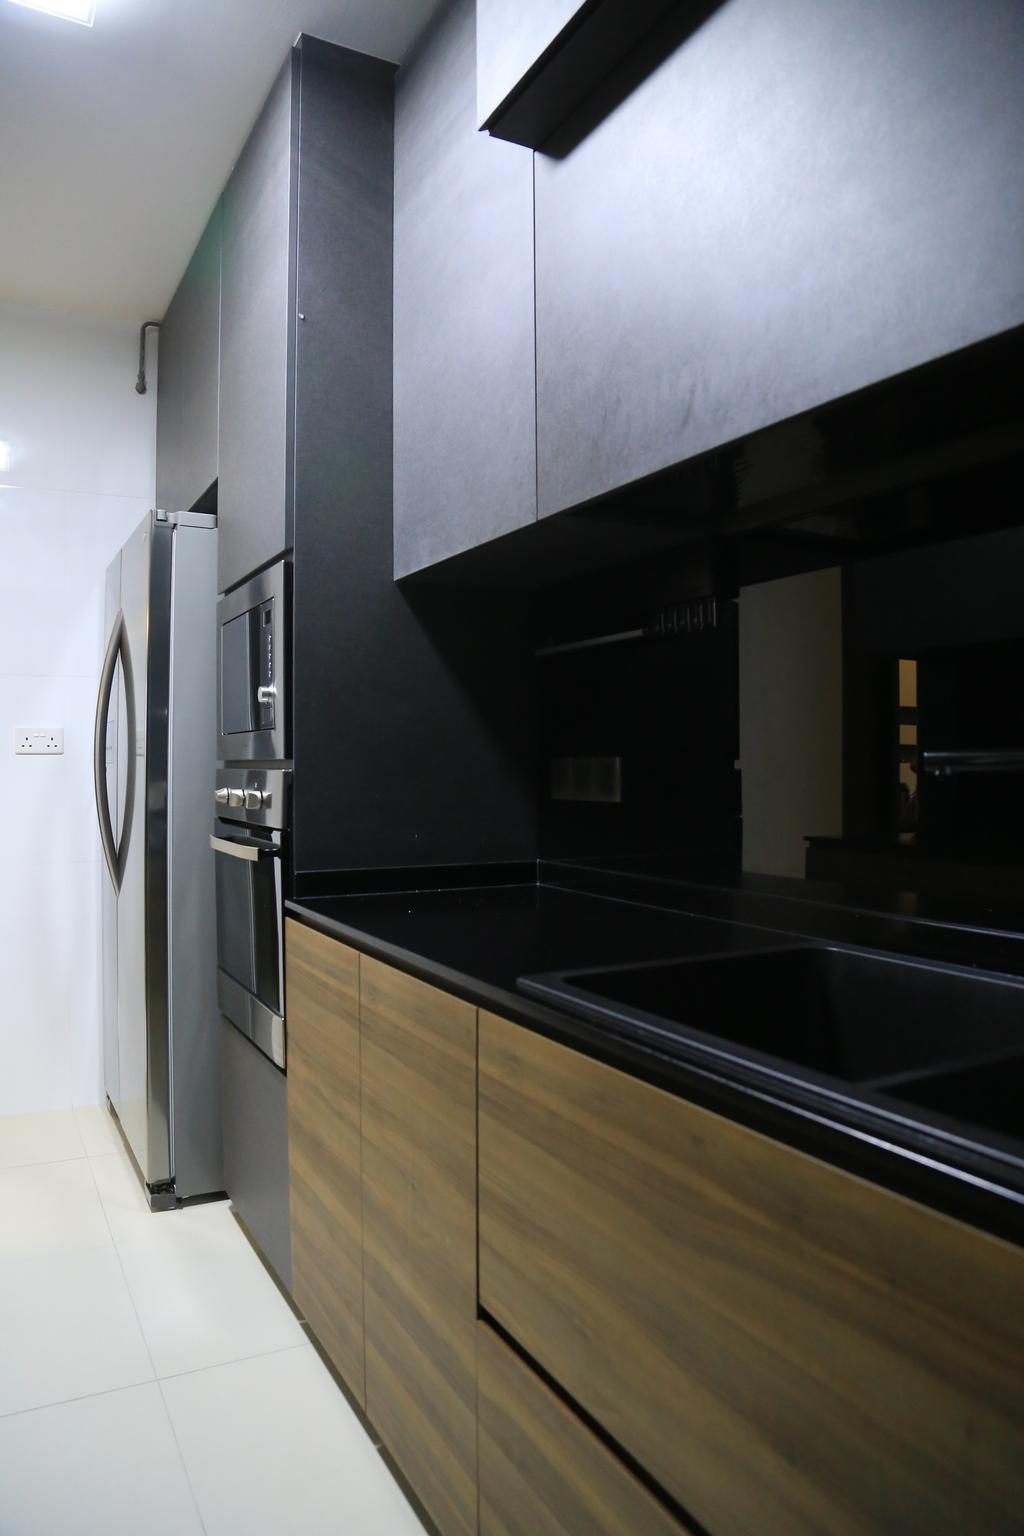 Transitional, HDB, Kitchen, Punggol Walk (Block 310B), Interior Designer, Forefront Interior, Refrigerator, Kitchen Cabinet, Cabinetry, Backsplash, Wood, Black Countertop